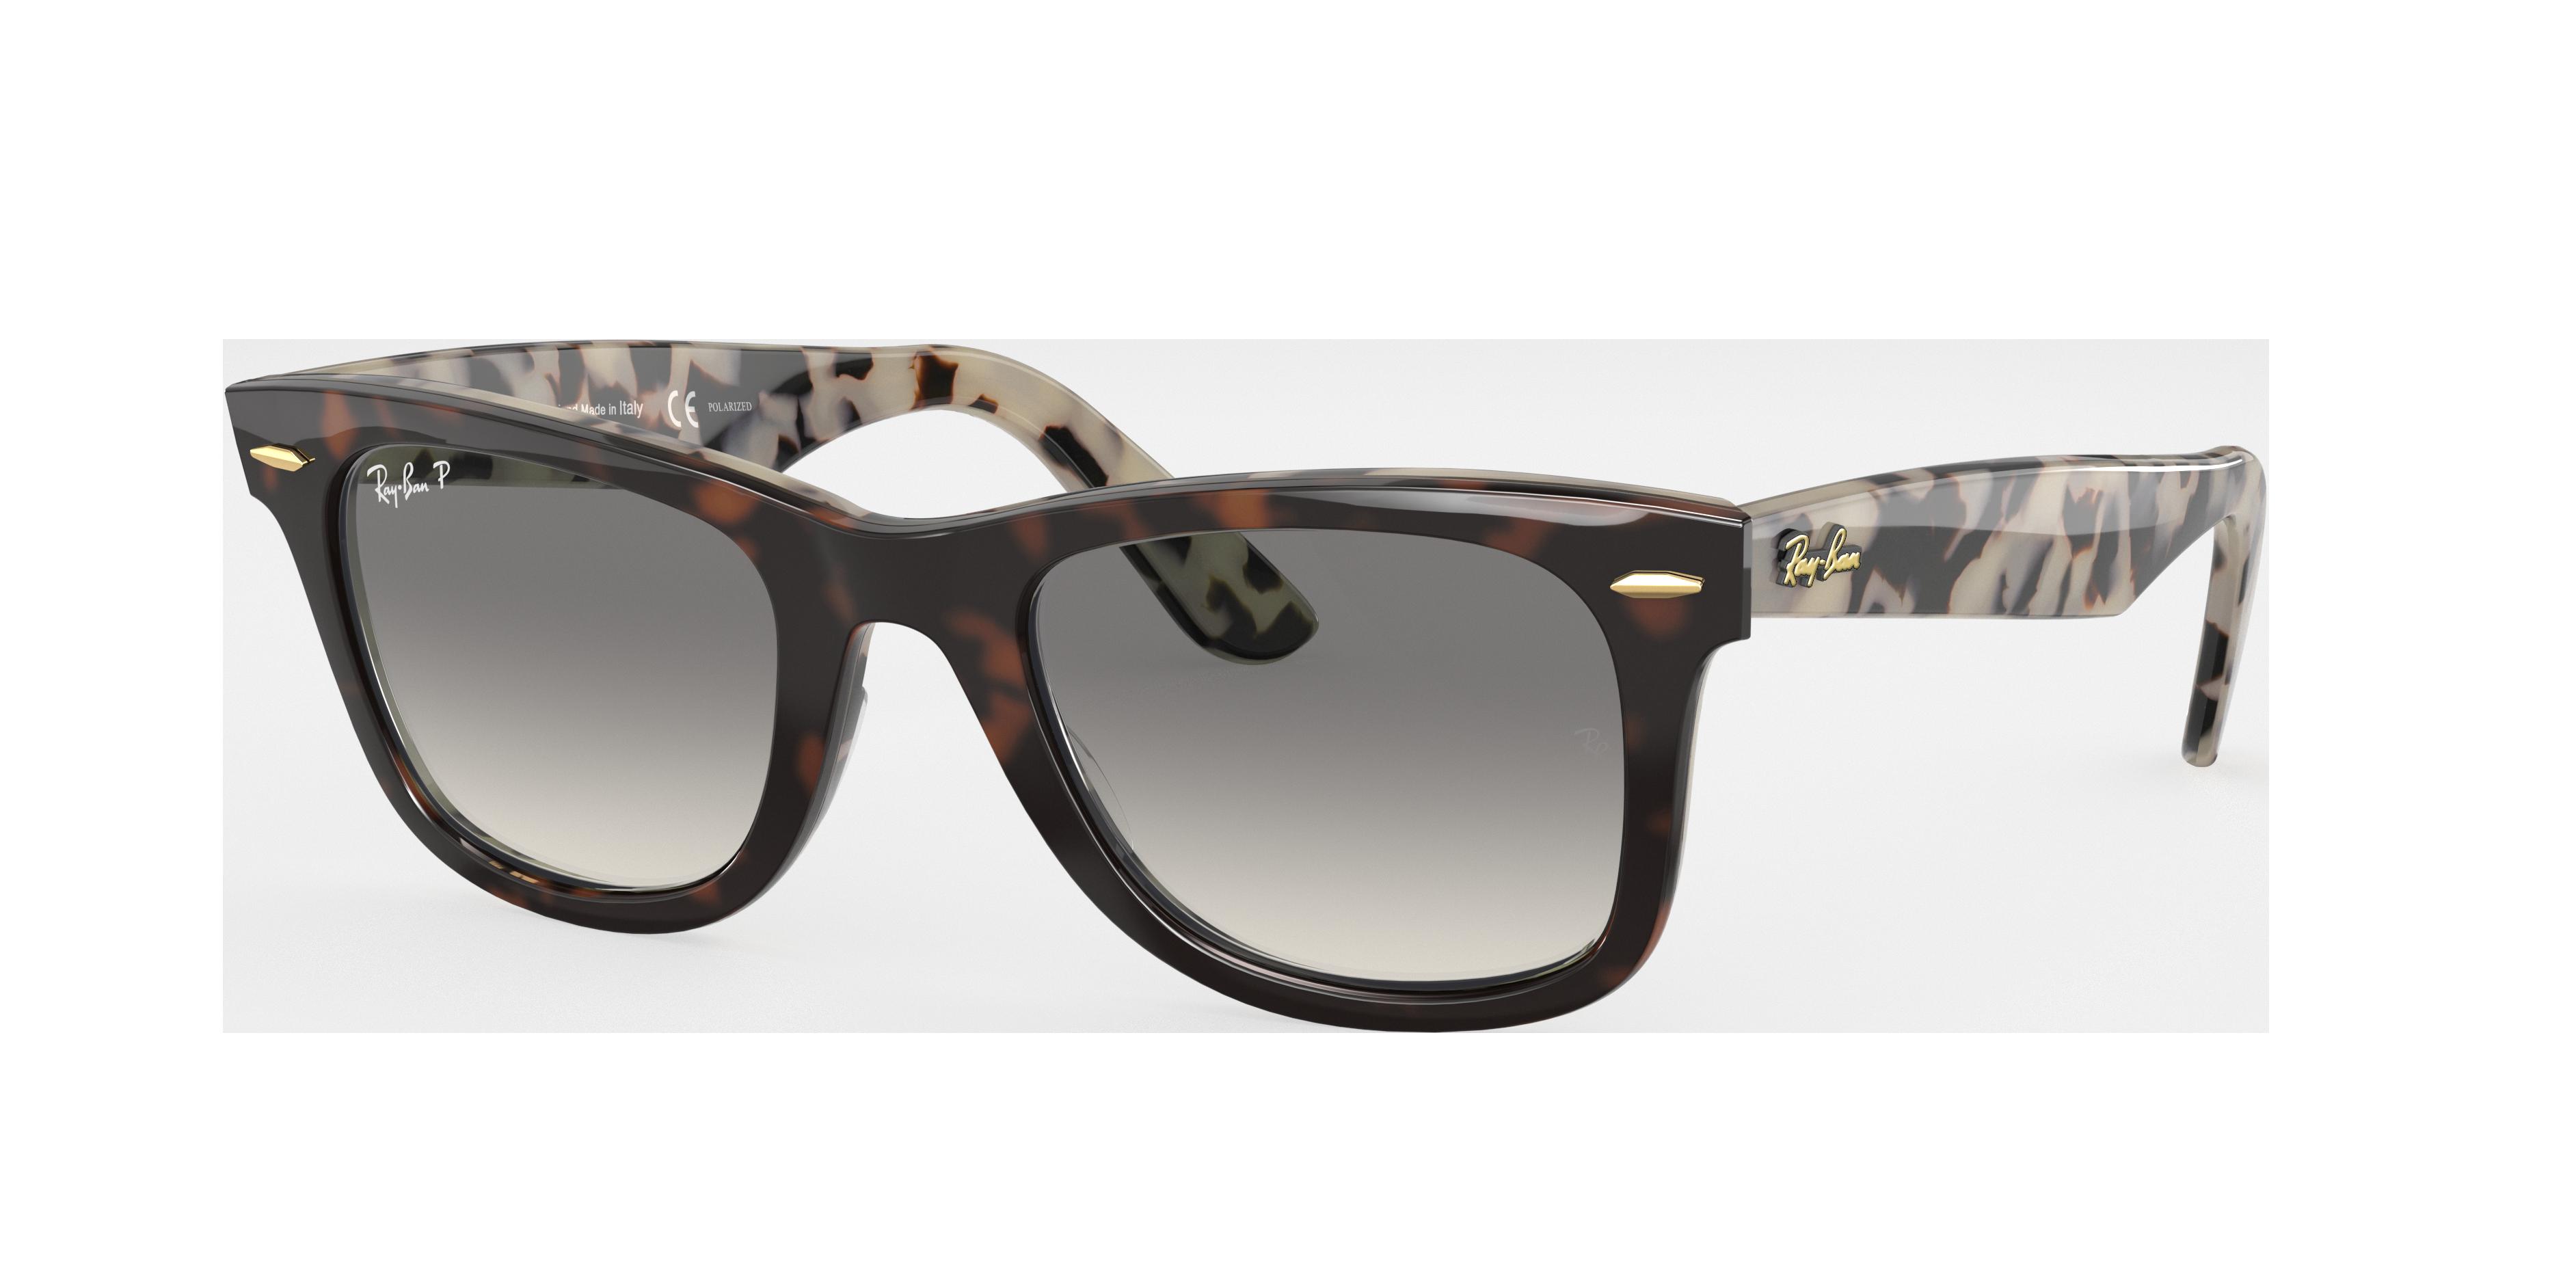 Ray-Ban Original Wayfarer @collection Tortoise, Polarized Gray Lenses - RB2140